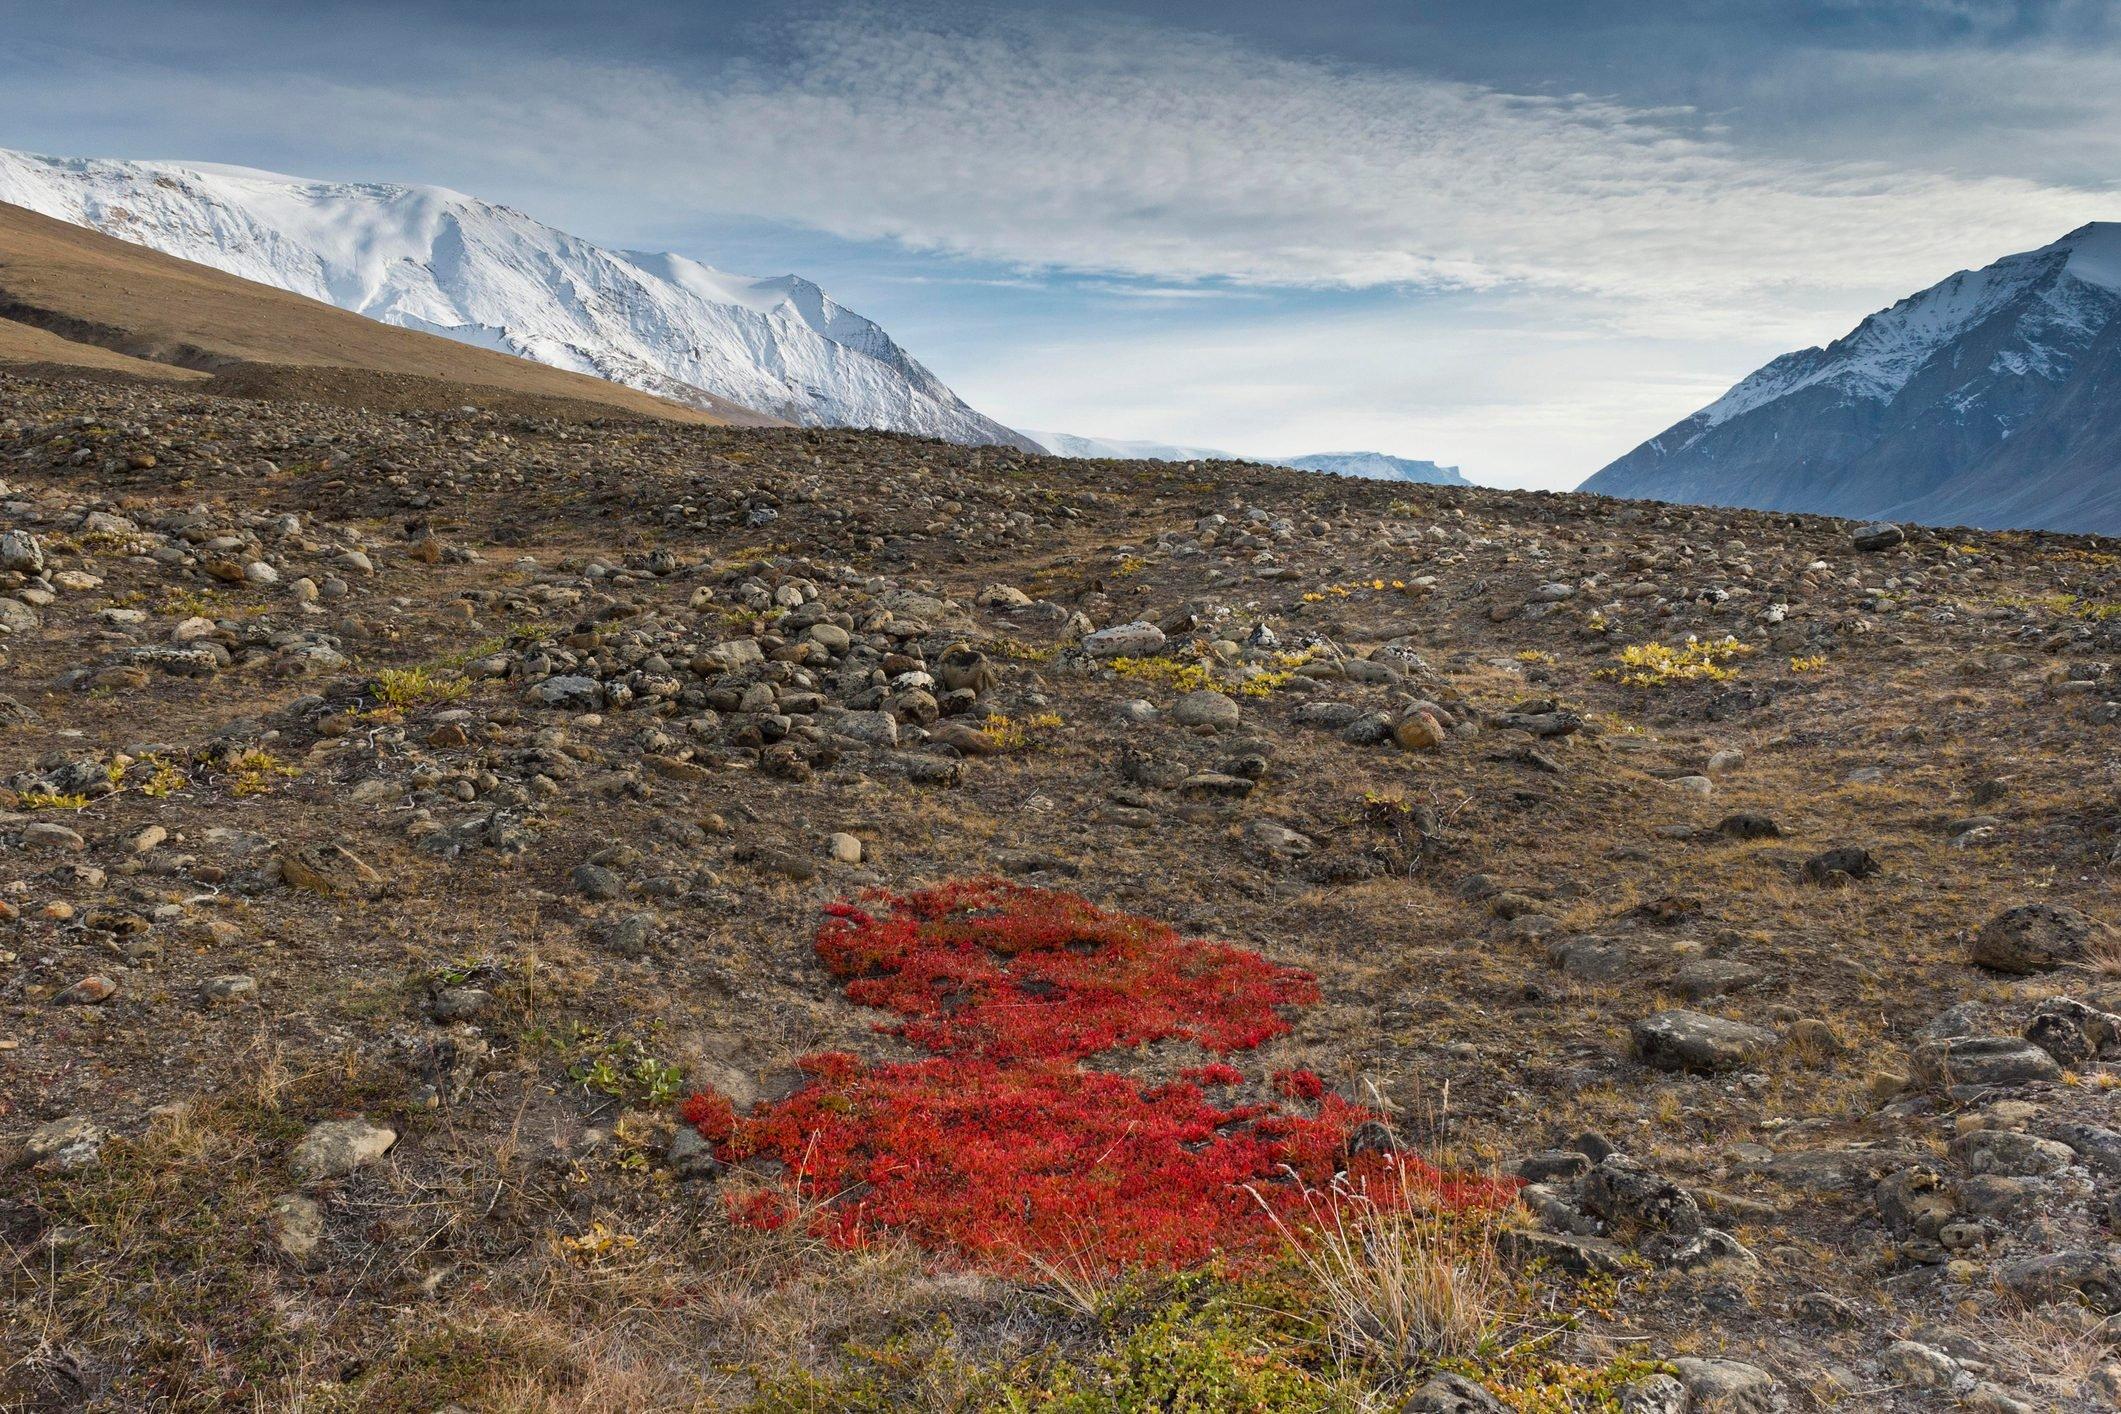 Autumn colored alpine or mountain bearberry (Arctostaphylos alpinus), Paradisdal, Kjerulf Fjord, branch of the Kaiser Franz Josef Fjord, Northeast Greenland National Park, Greenland